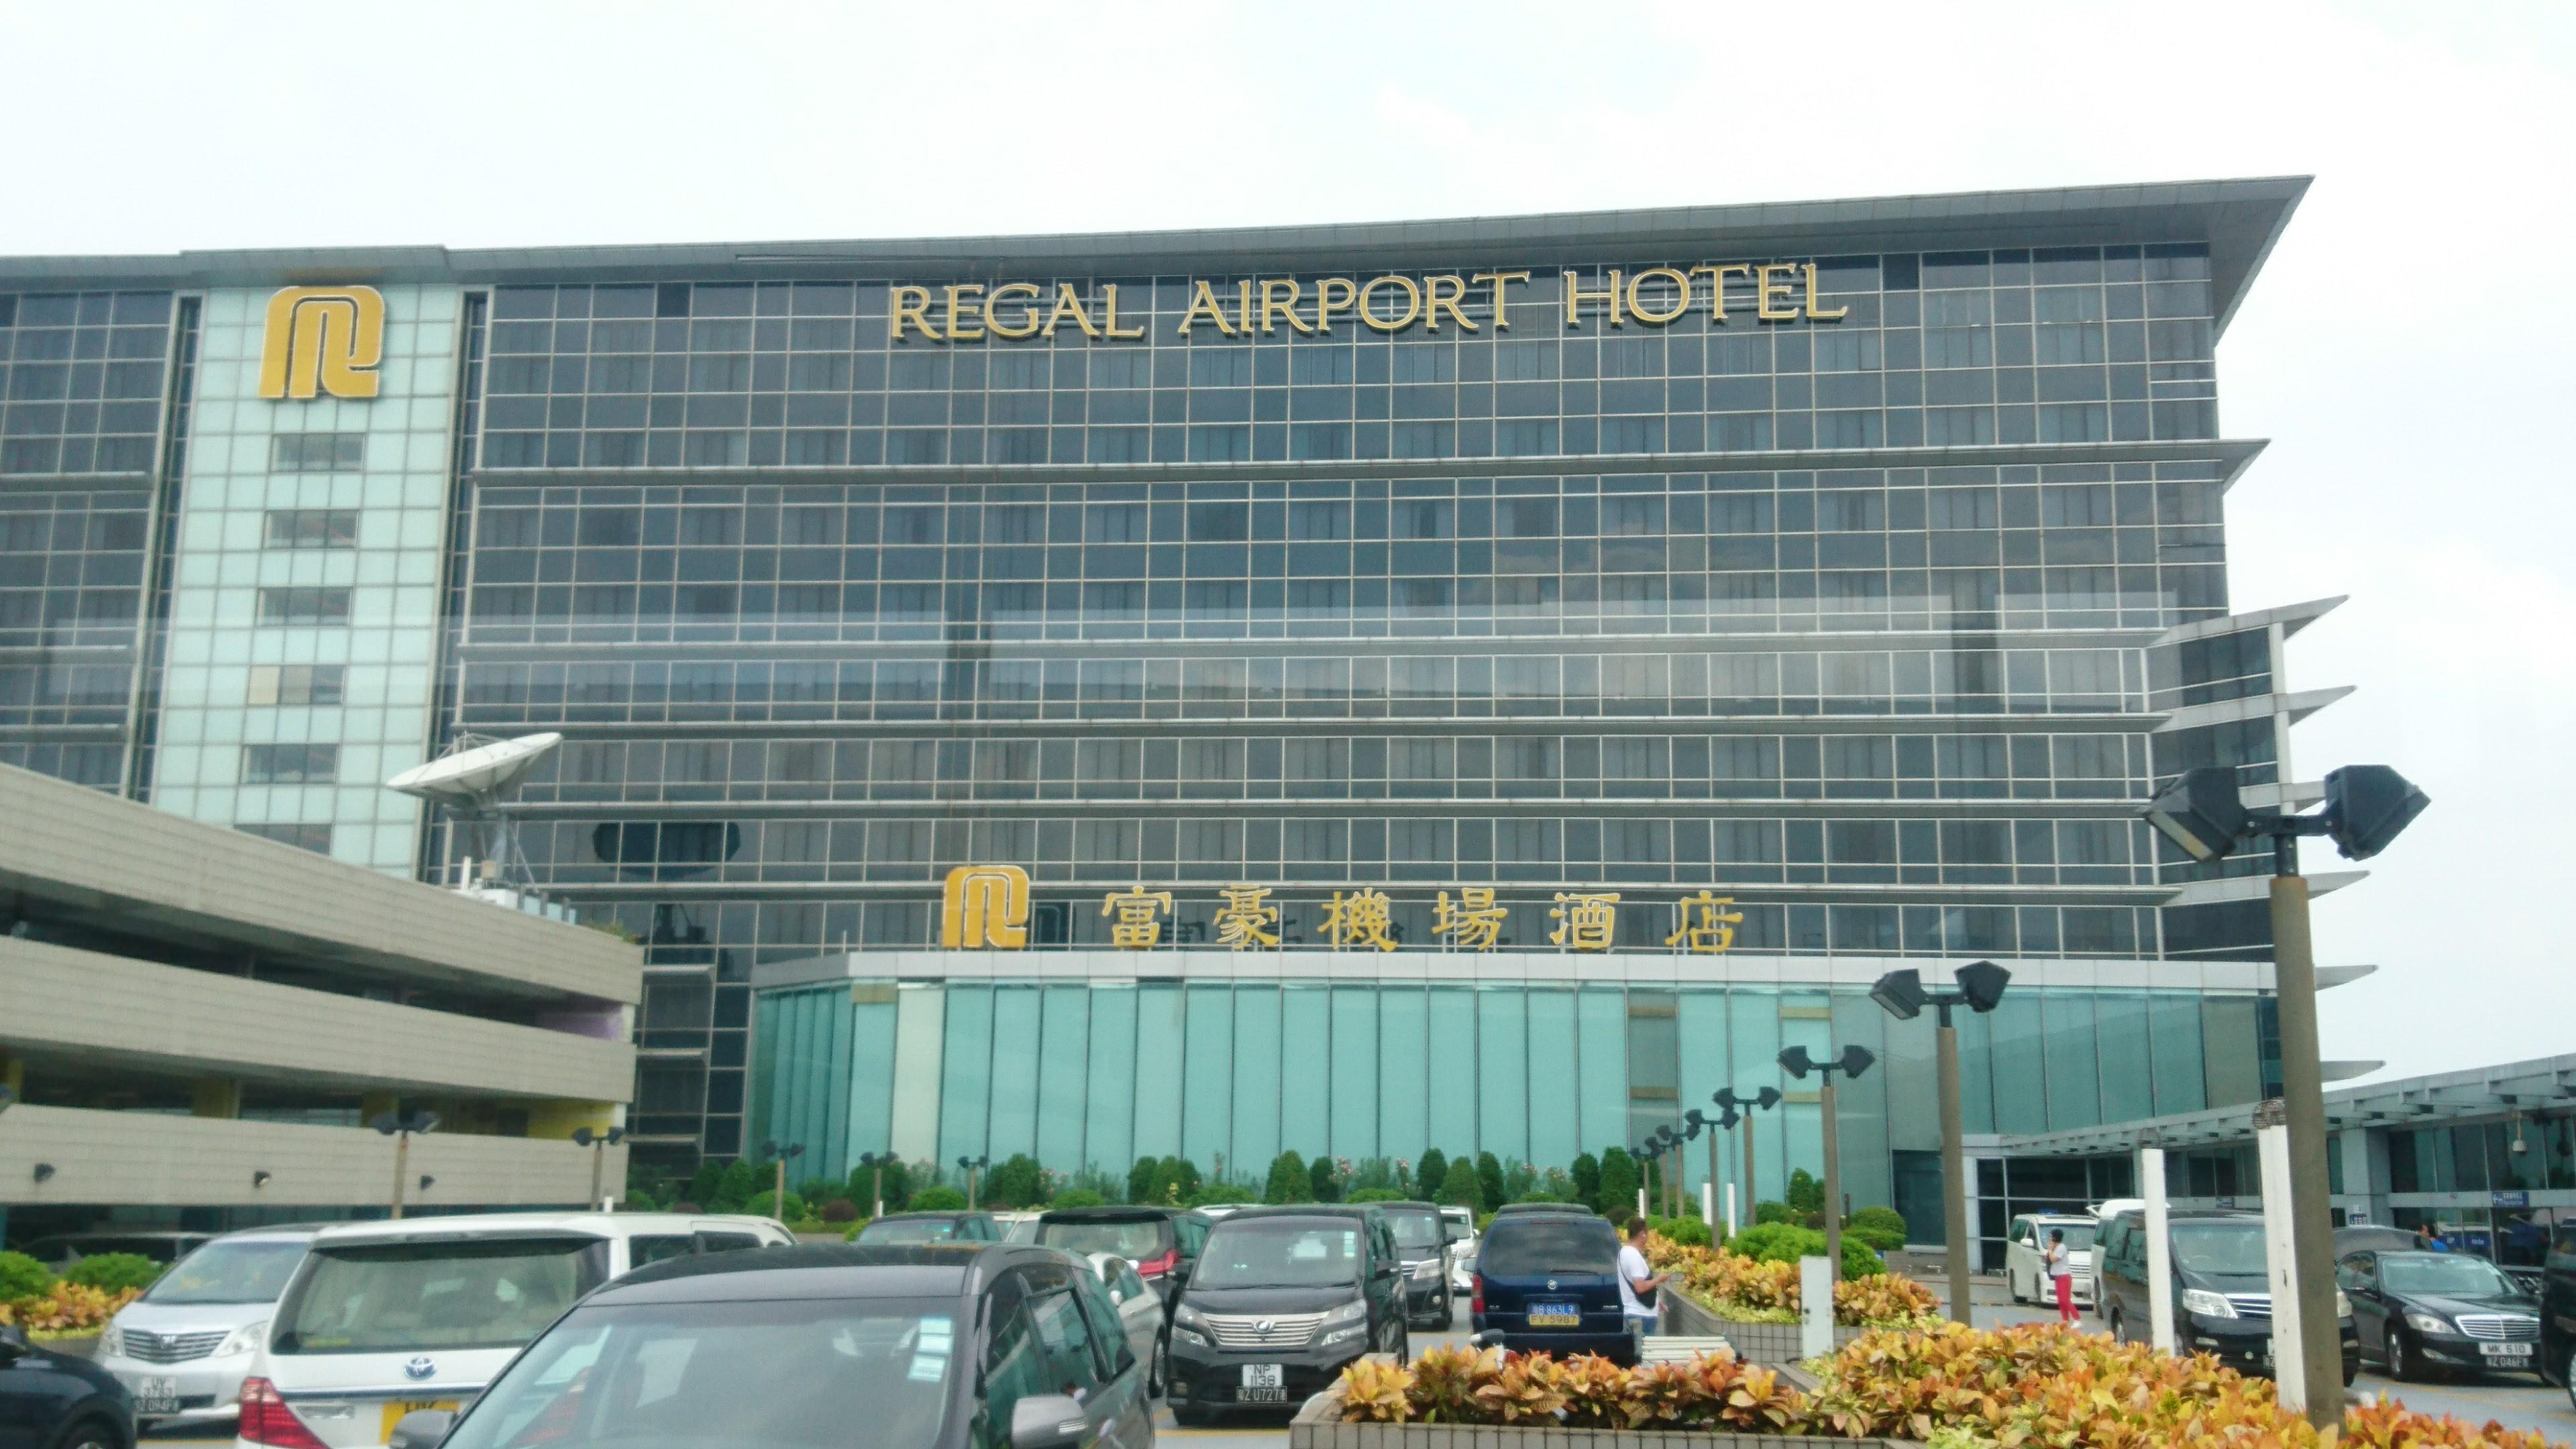 REGAL AIRPORT HOTEL 香港富豪機場酒店